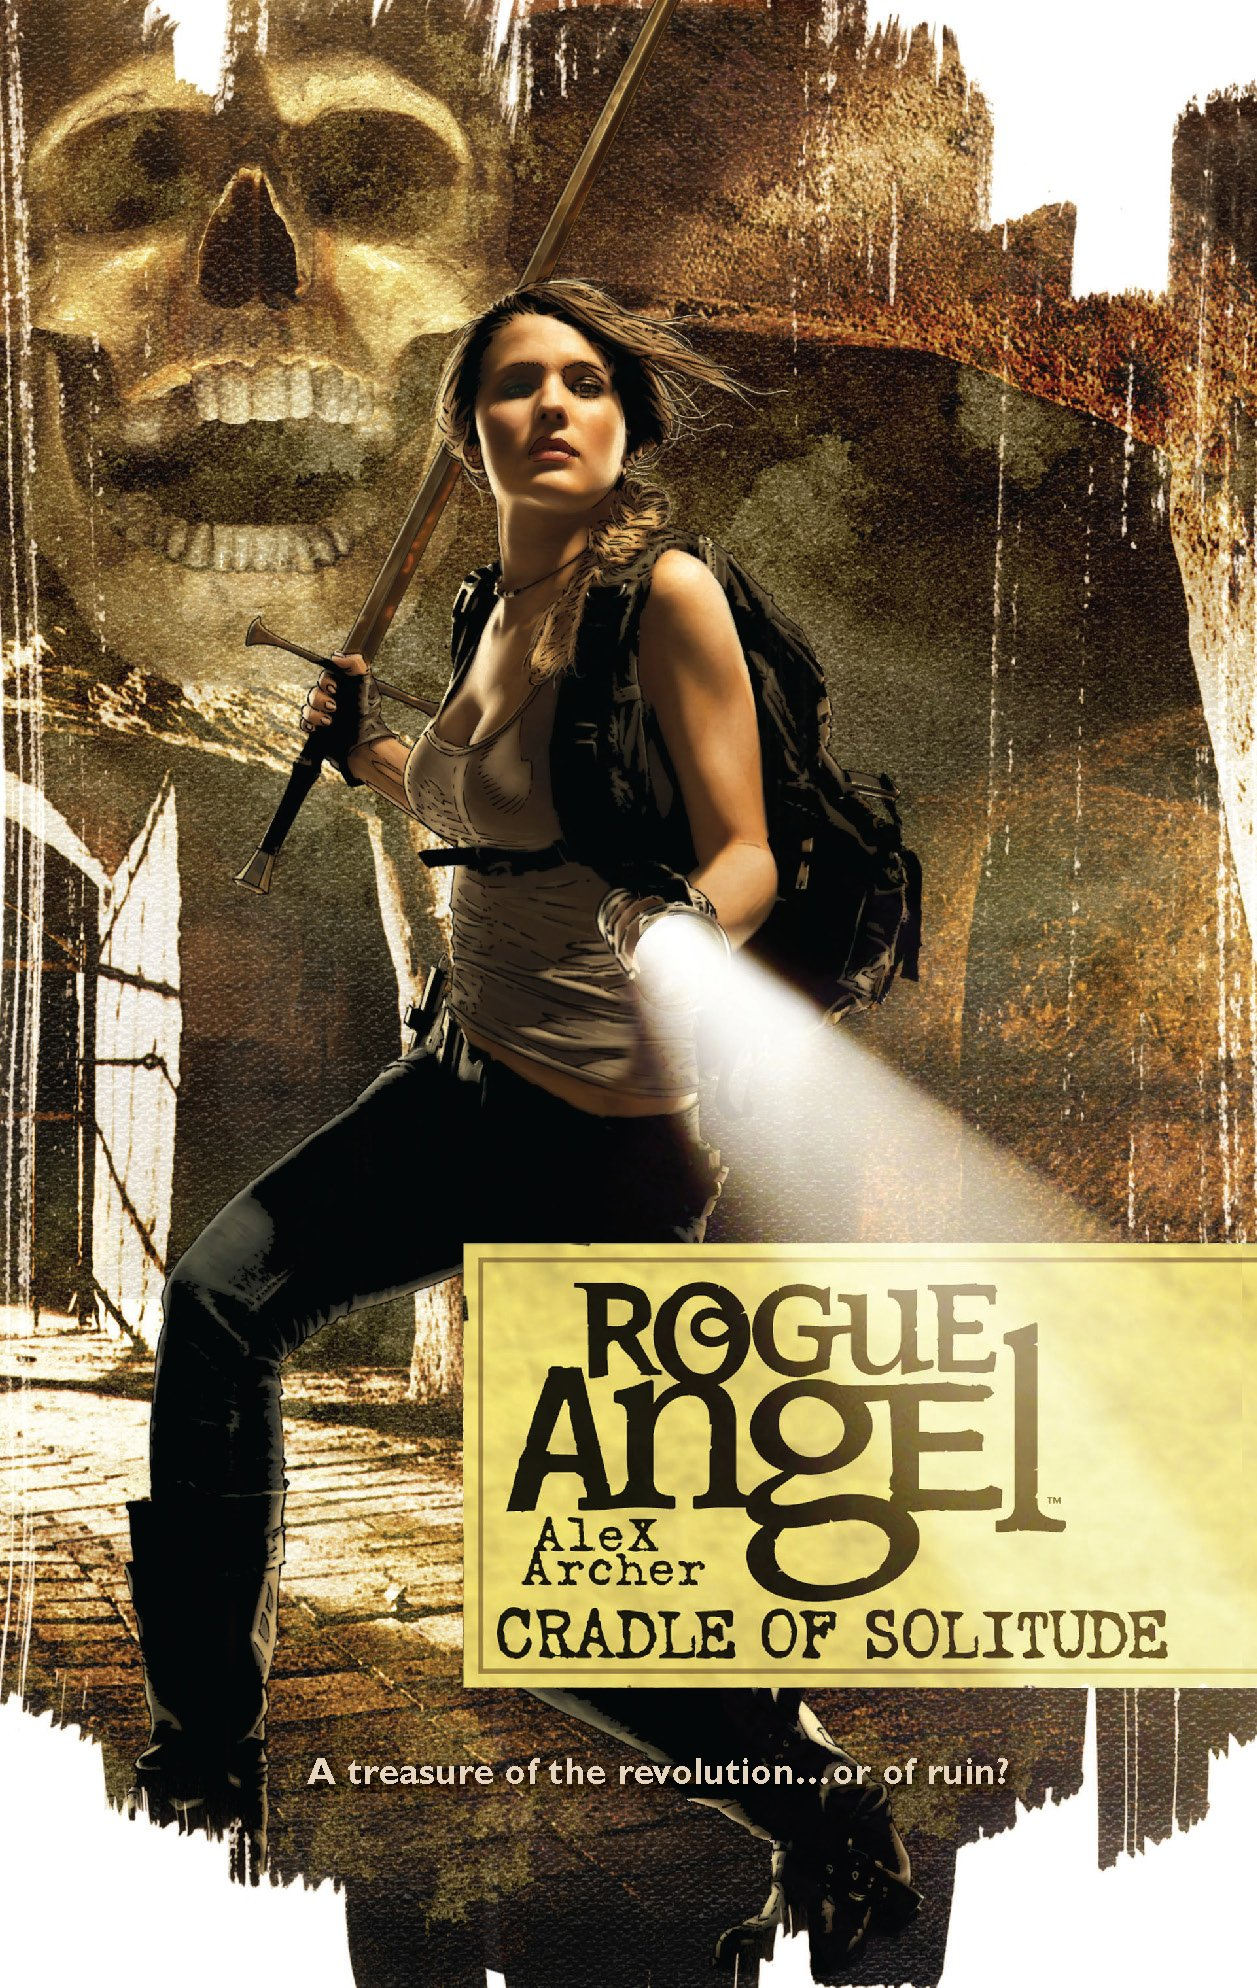 Amazon.com: Cradle of Solitude (Rogue Angel) (9780373621521): Alex Archer:  Books